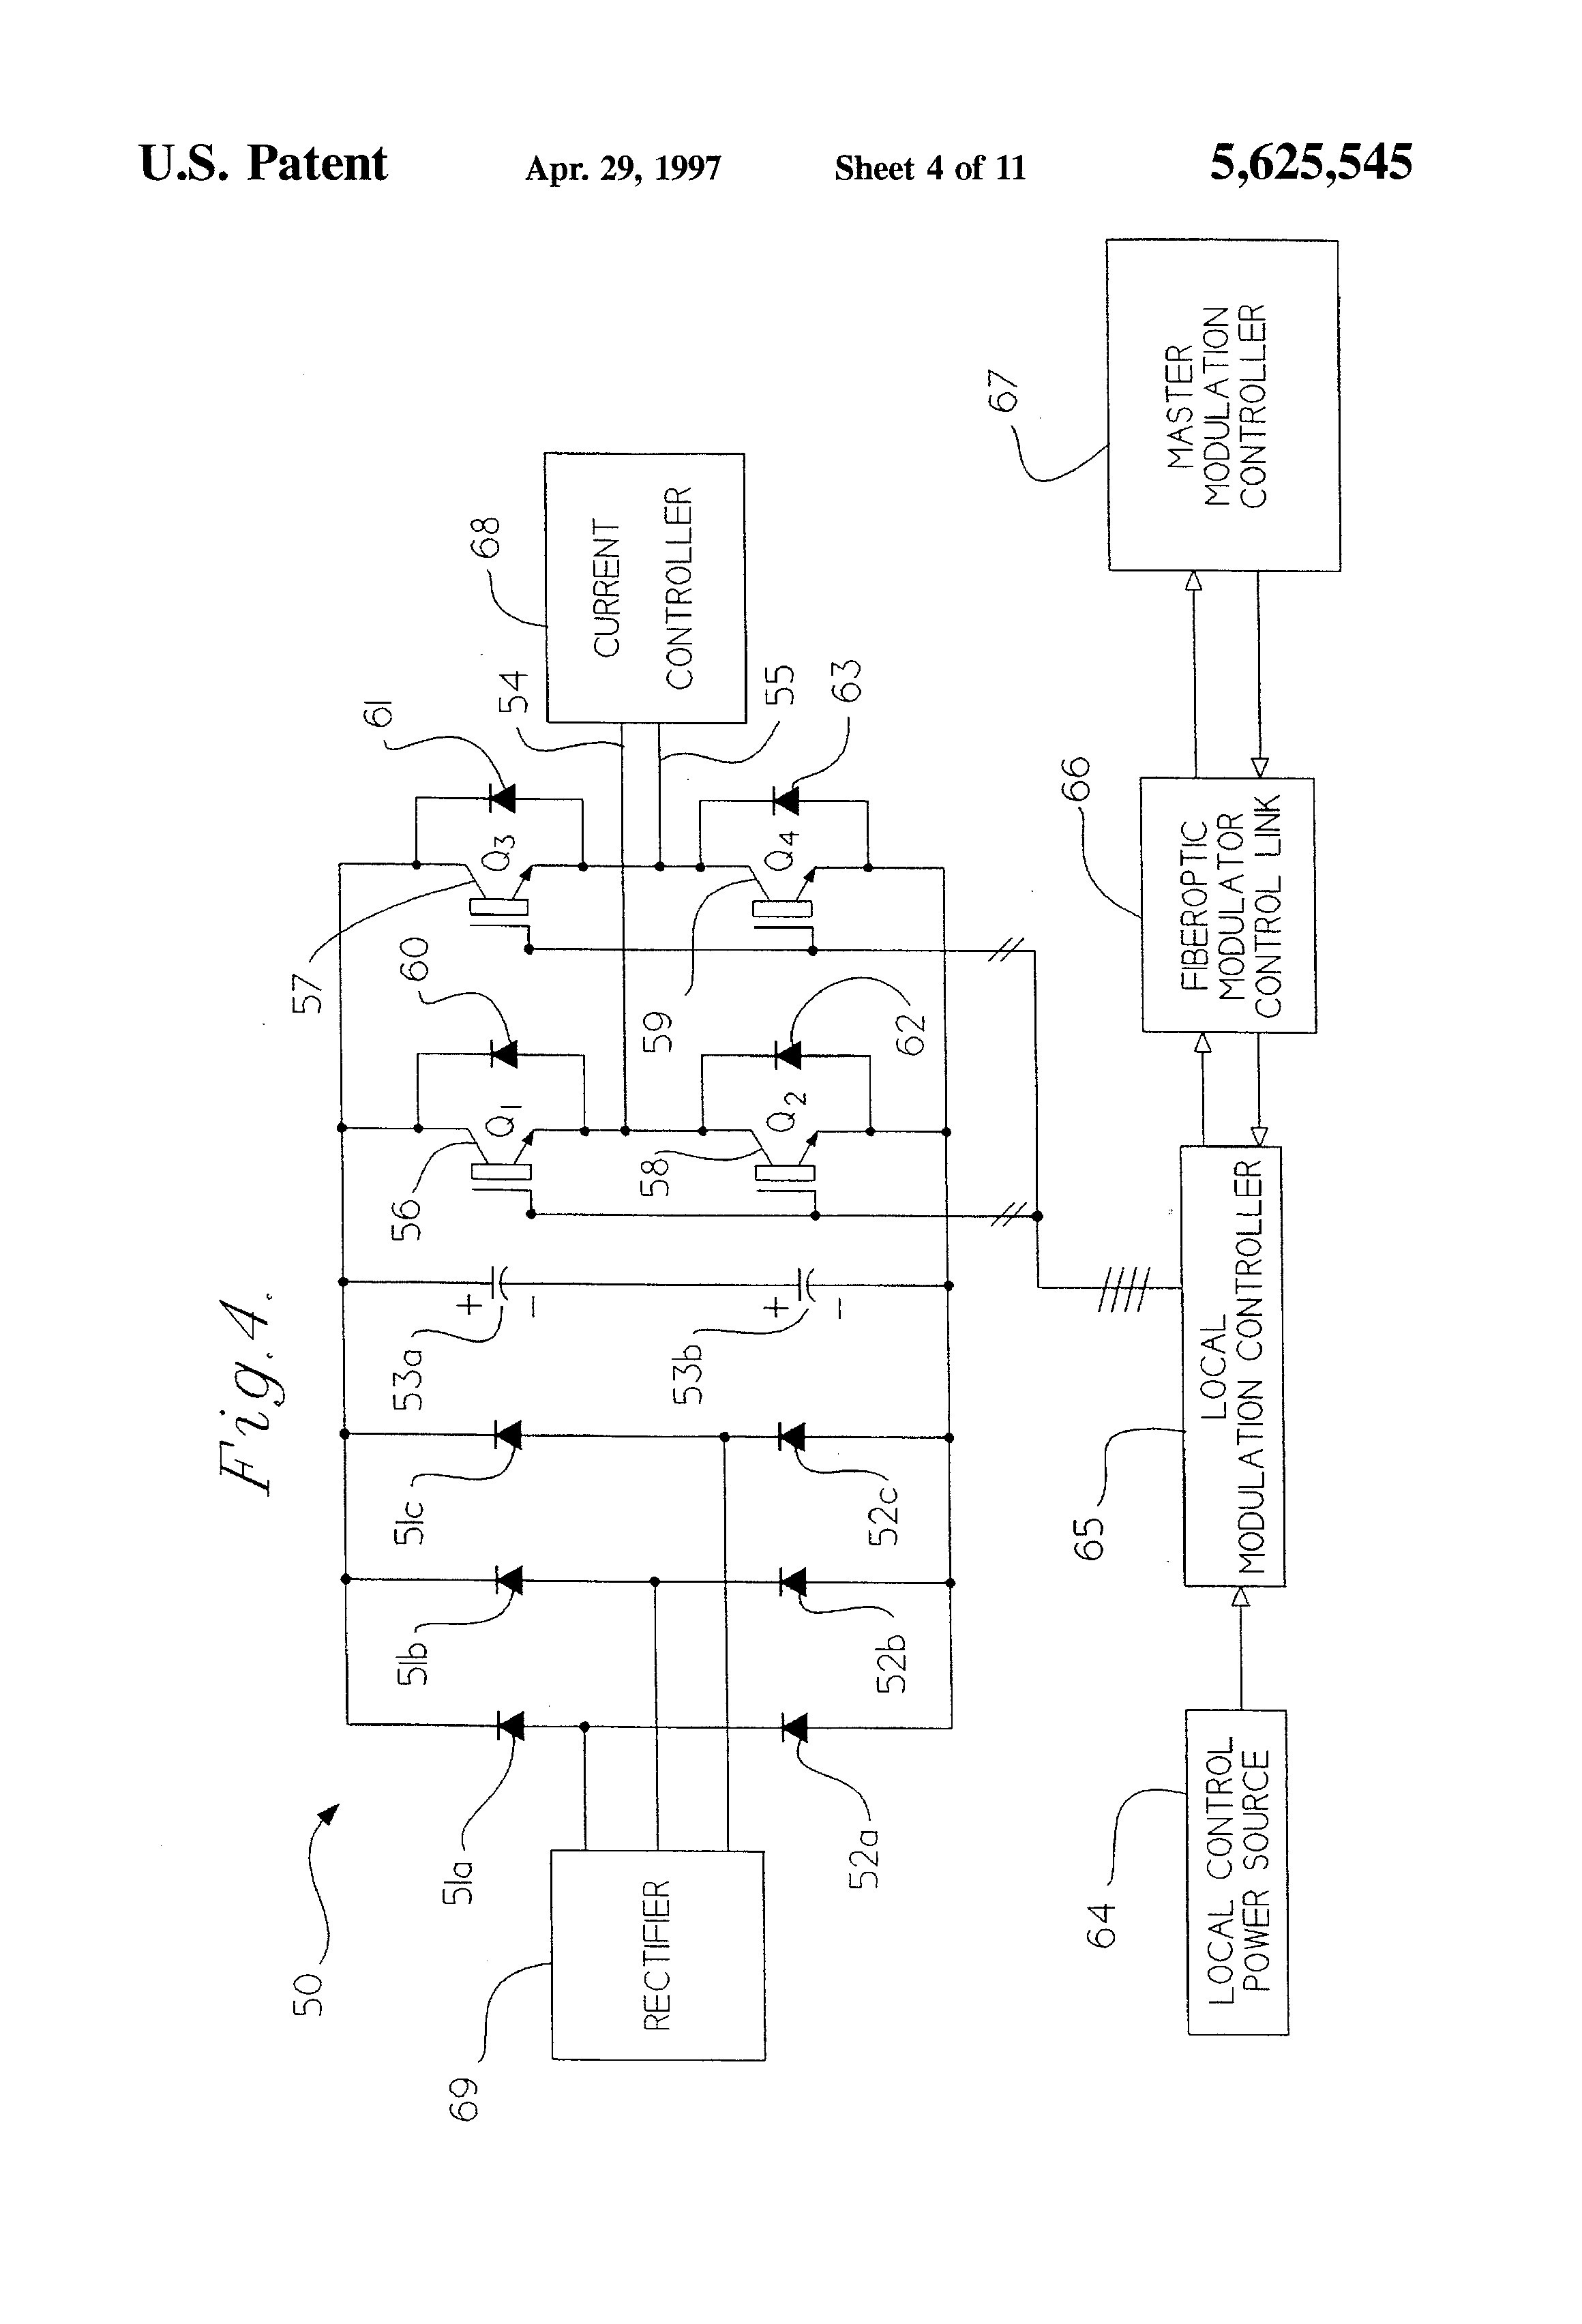 pro 197 wiring diagram wiring diagram read Radio Shack Pro 197